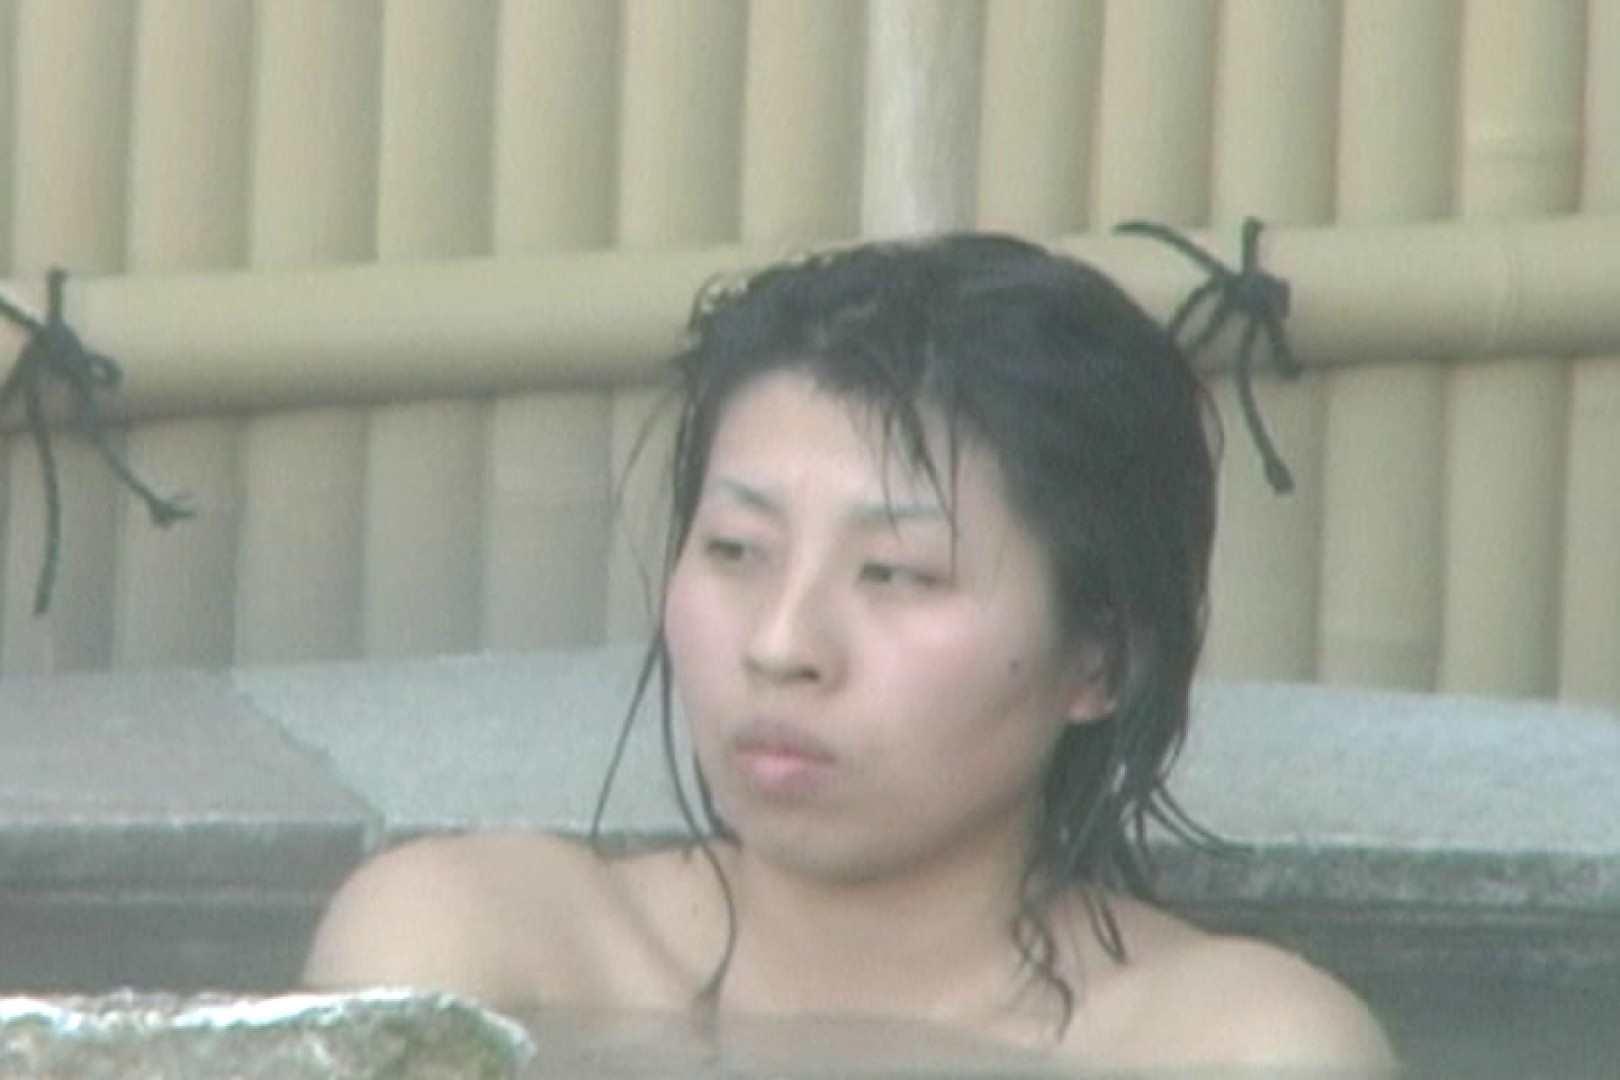 Aquaな露天風呂Vol.589 0   0  74連発 29